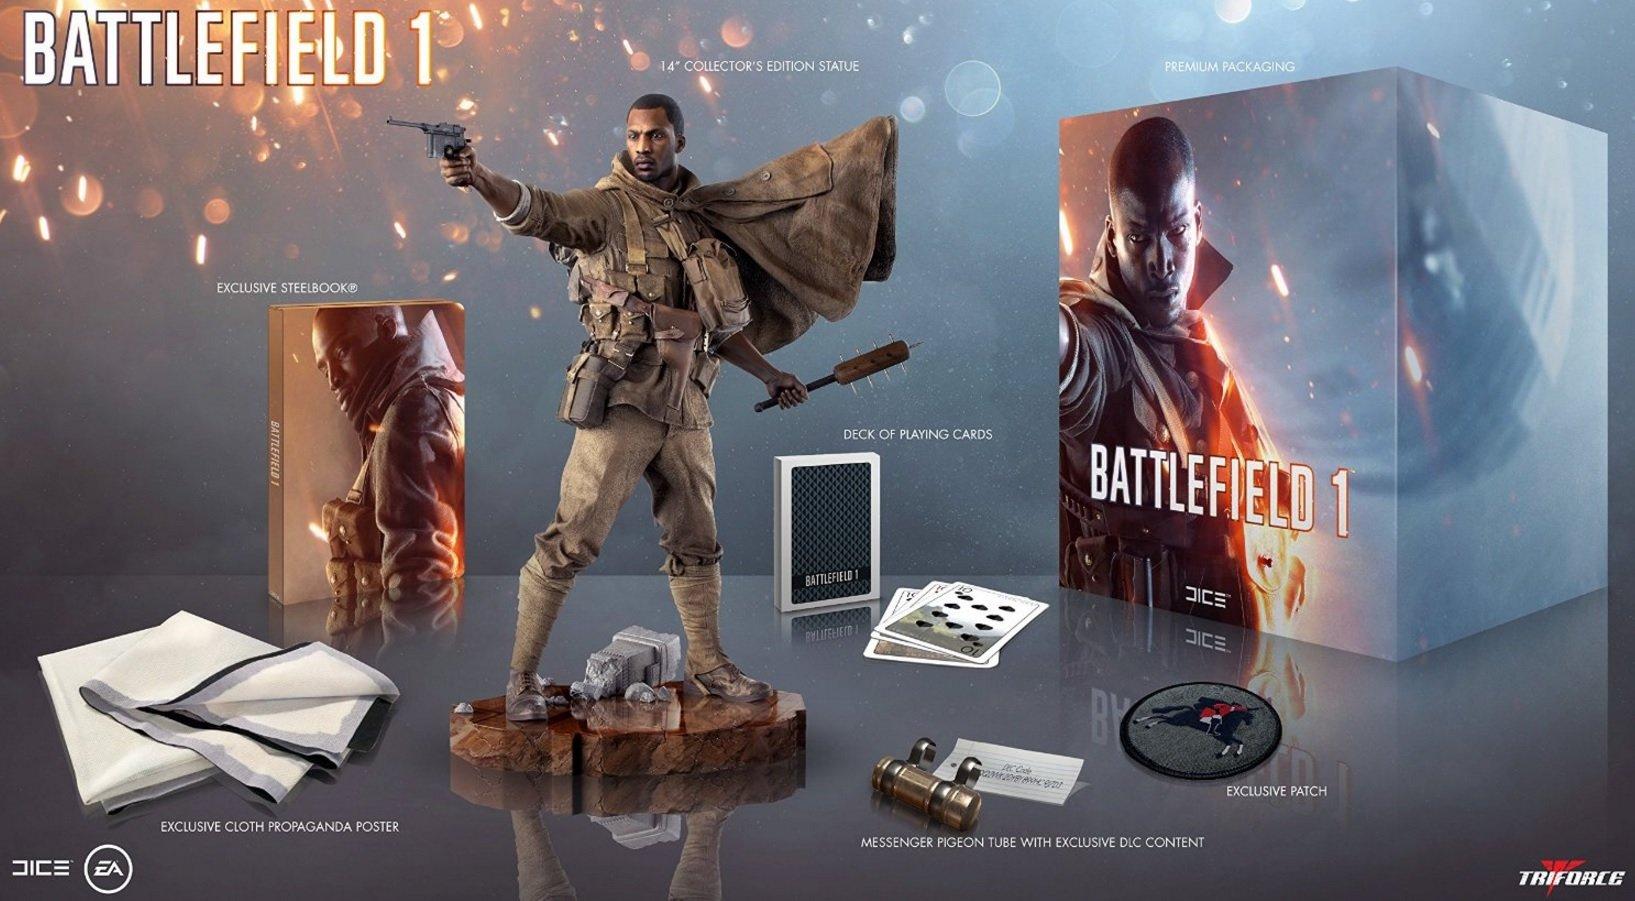 battlefield_1_collectors_edition.jpg?ito